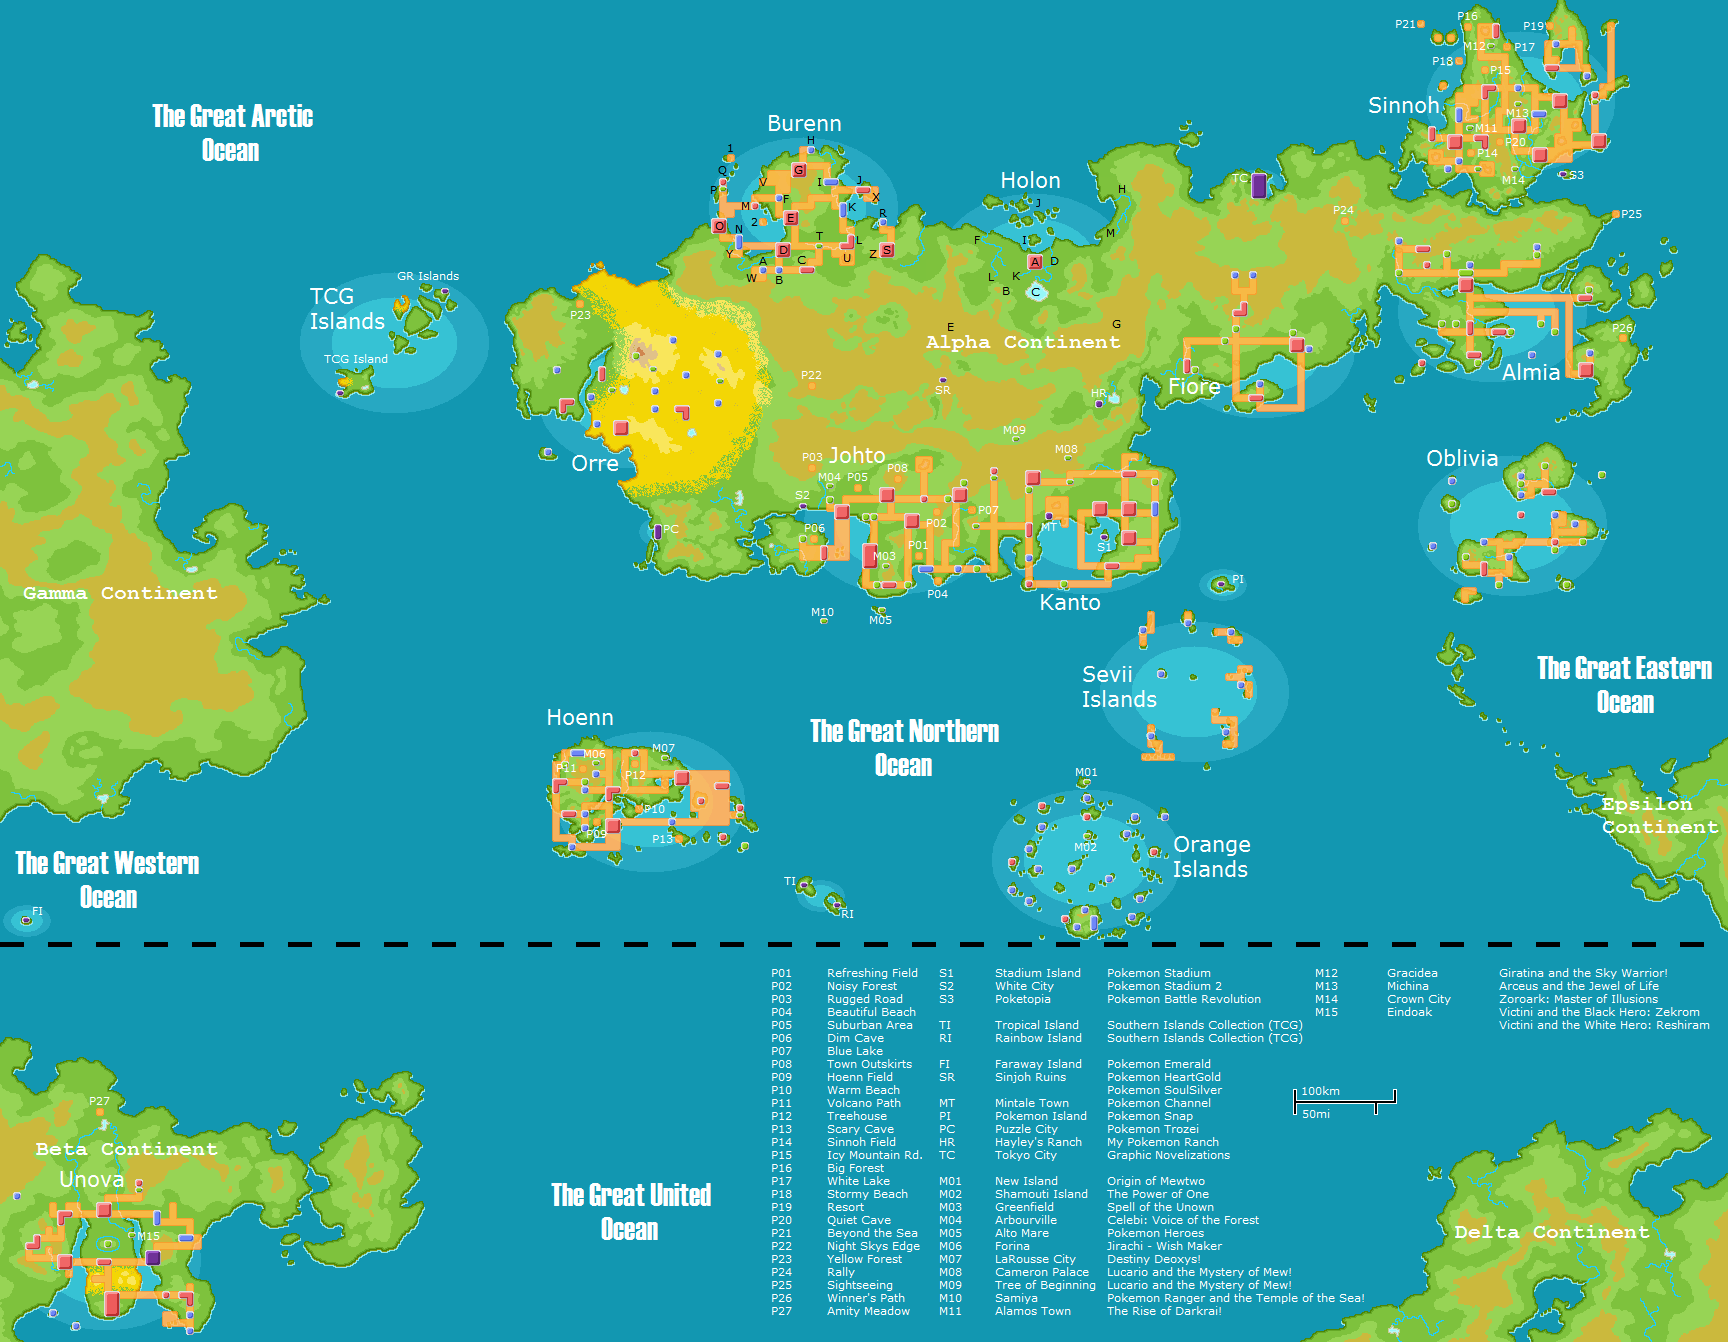 My Pokemon World Map v6.0 by JamisonHartley